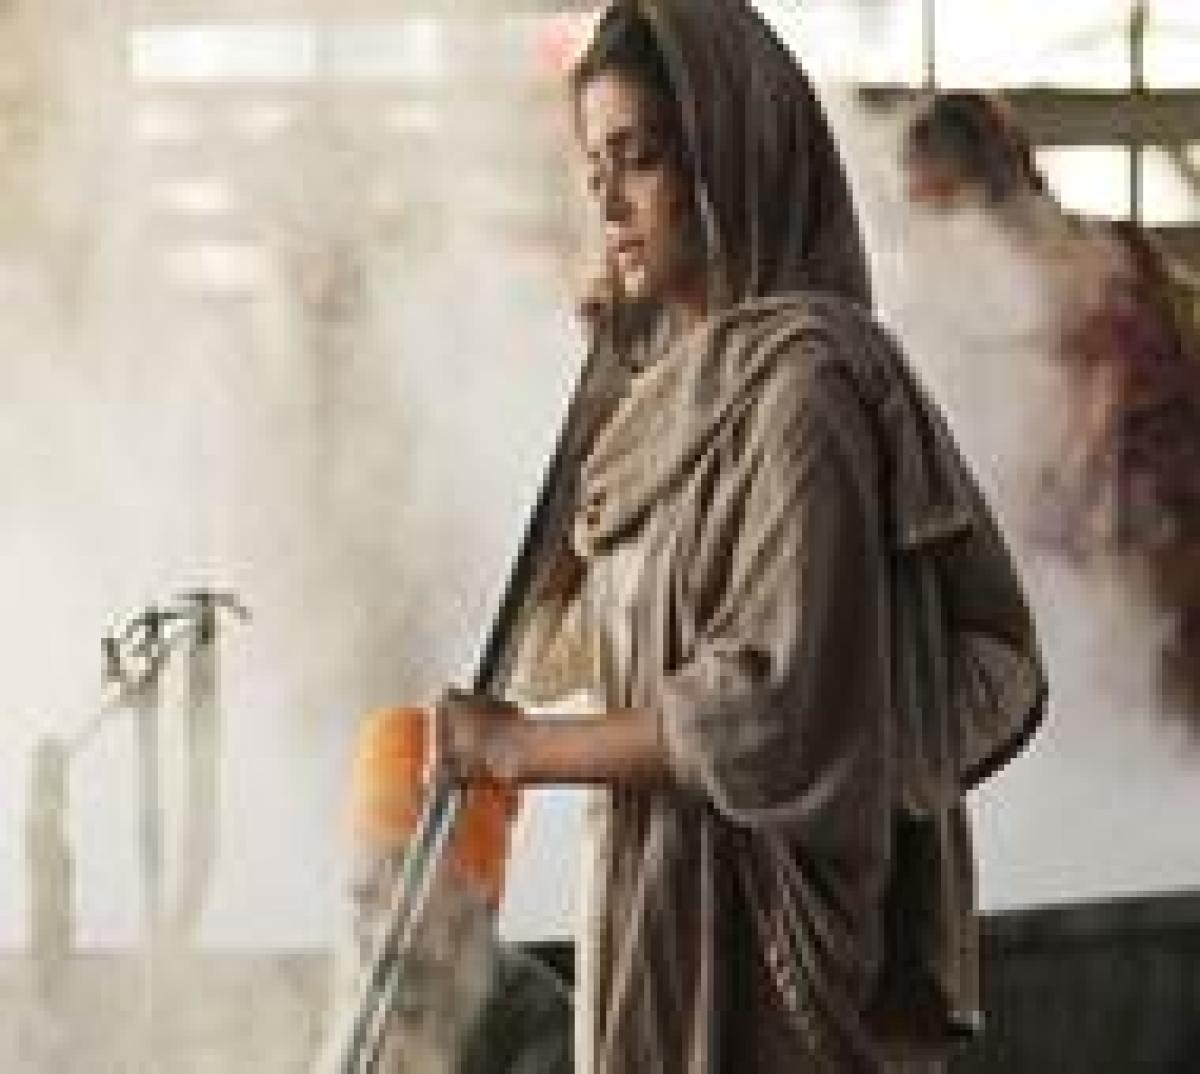 Sonu Nigam, Sukhwinder give musical tribute to Sarabjit